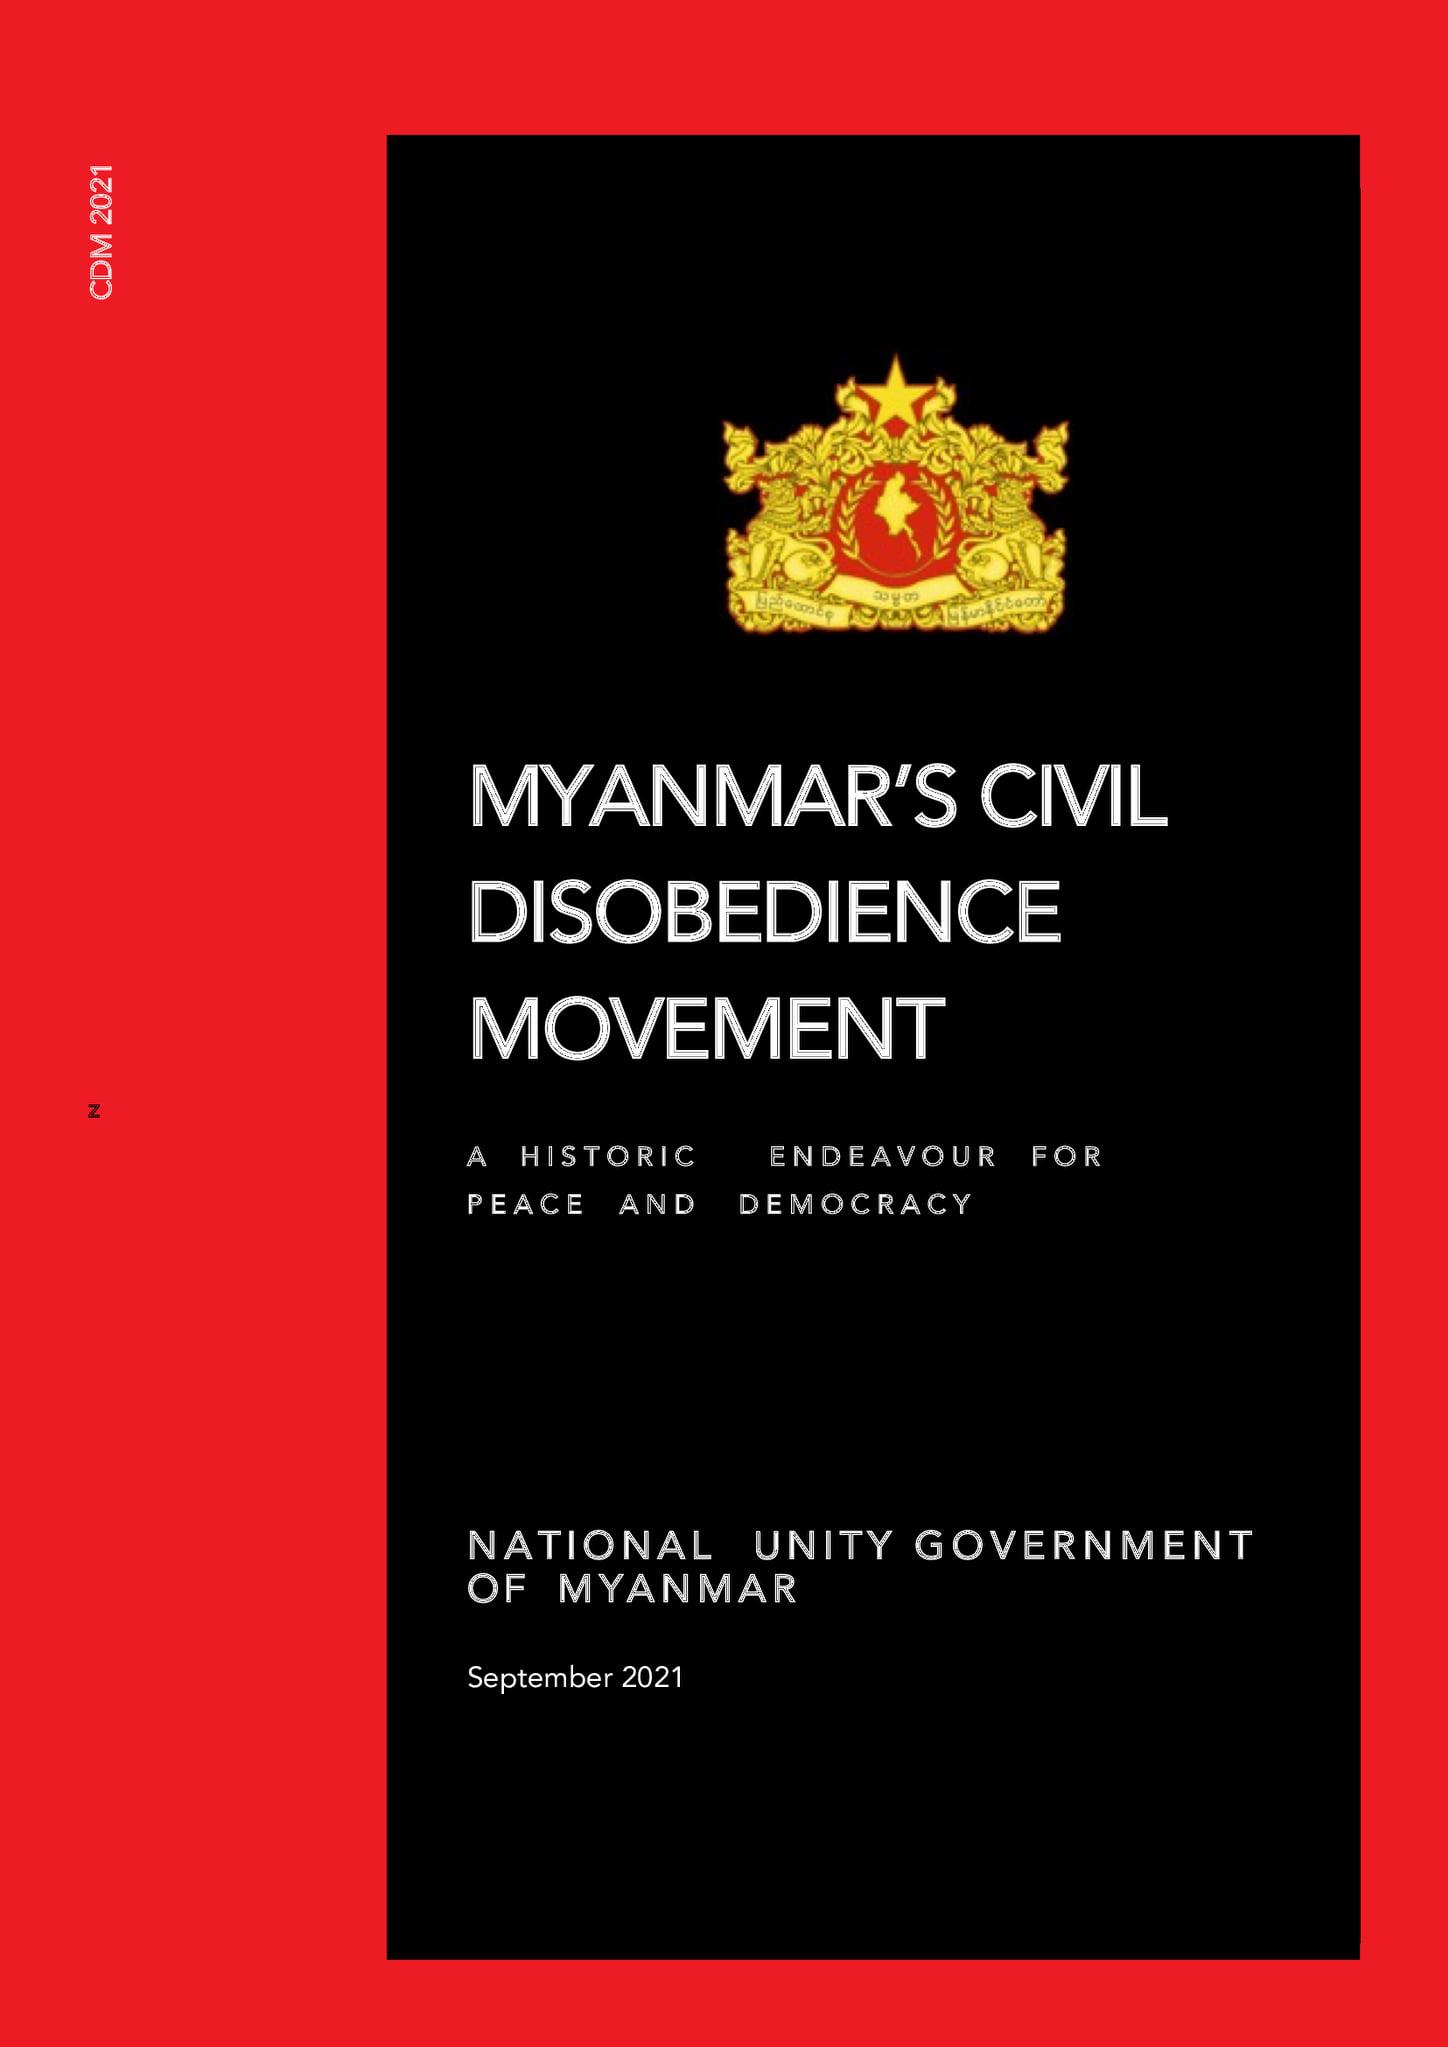 Civil Disobedience Movement - CDM